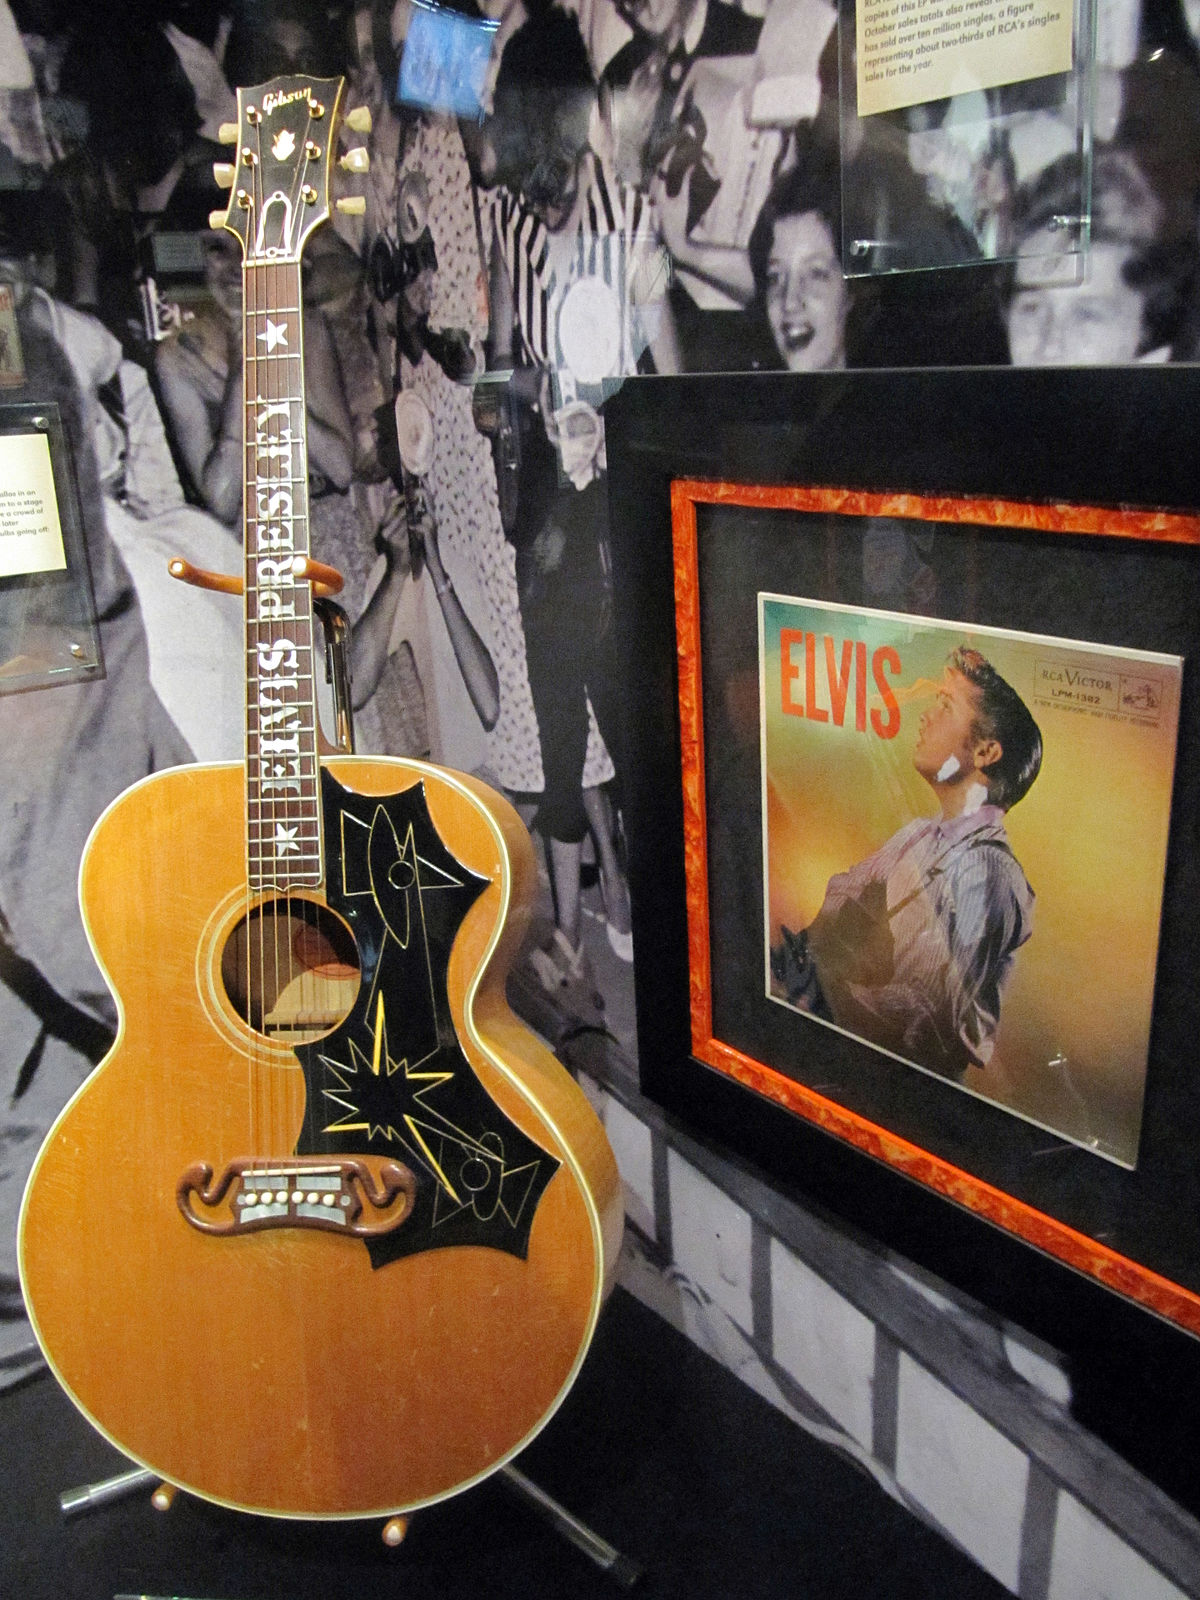 Elvis Presley's guitars - Wikipedia